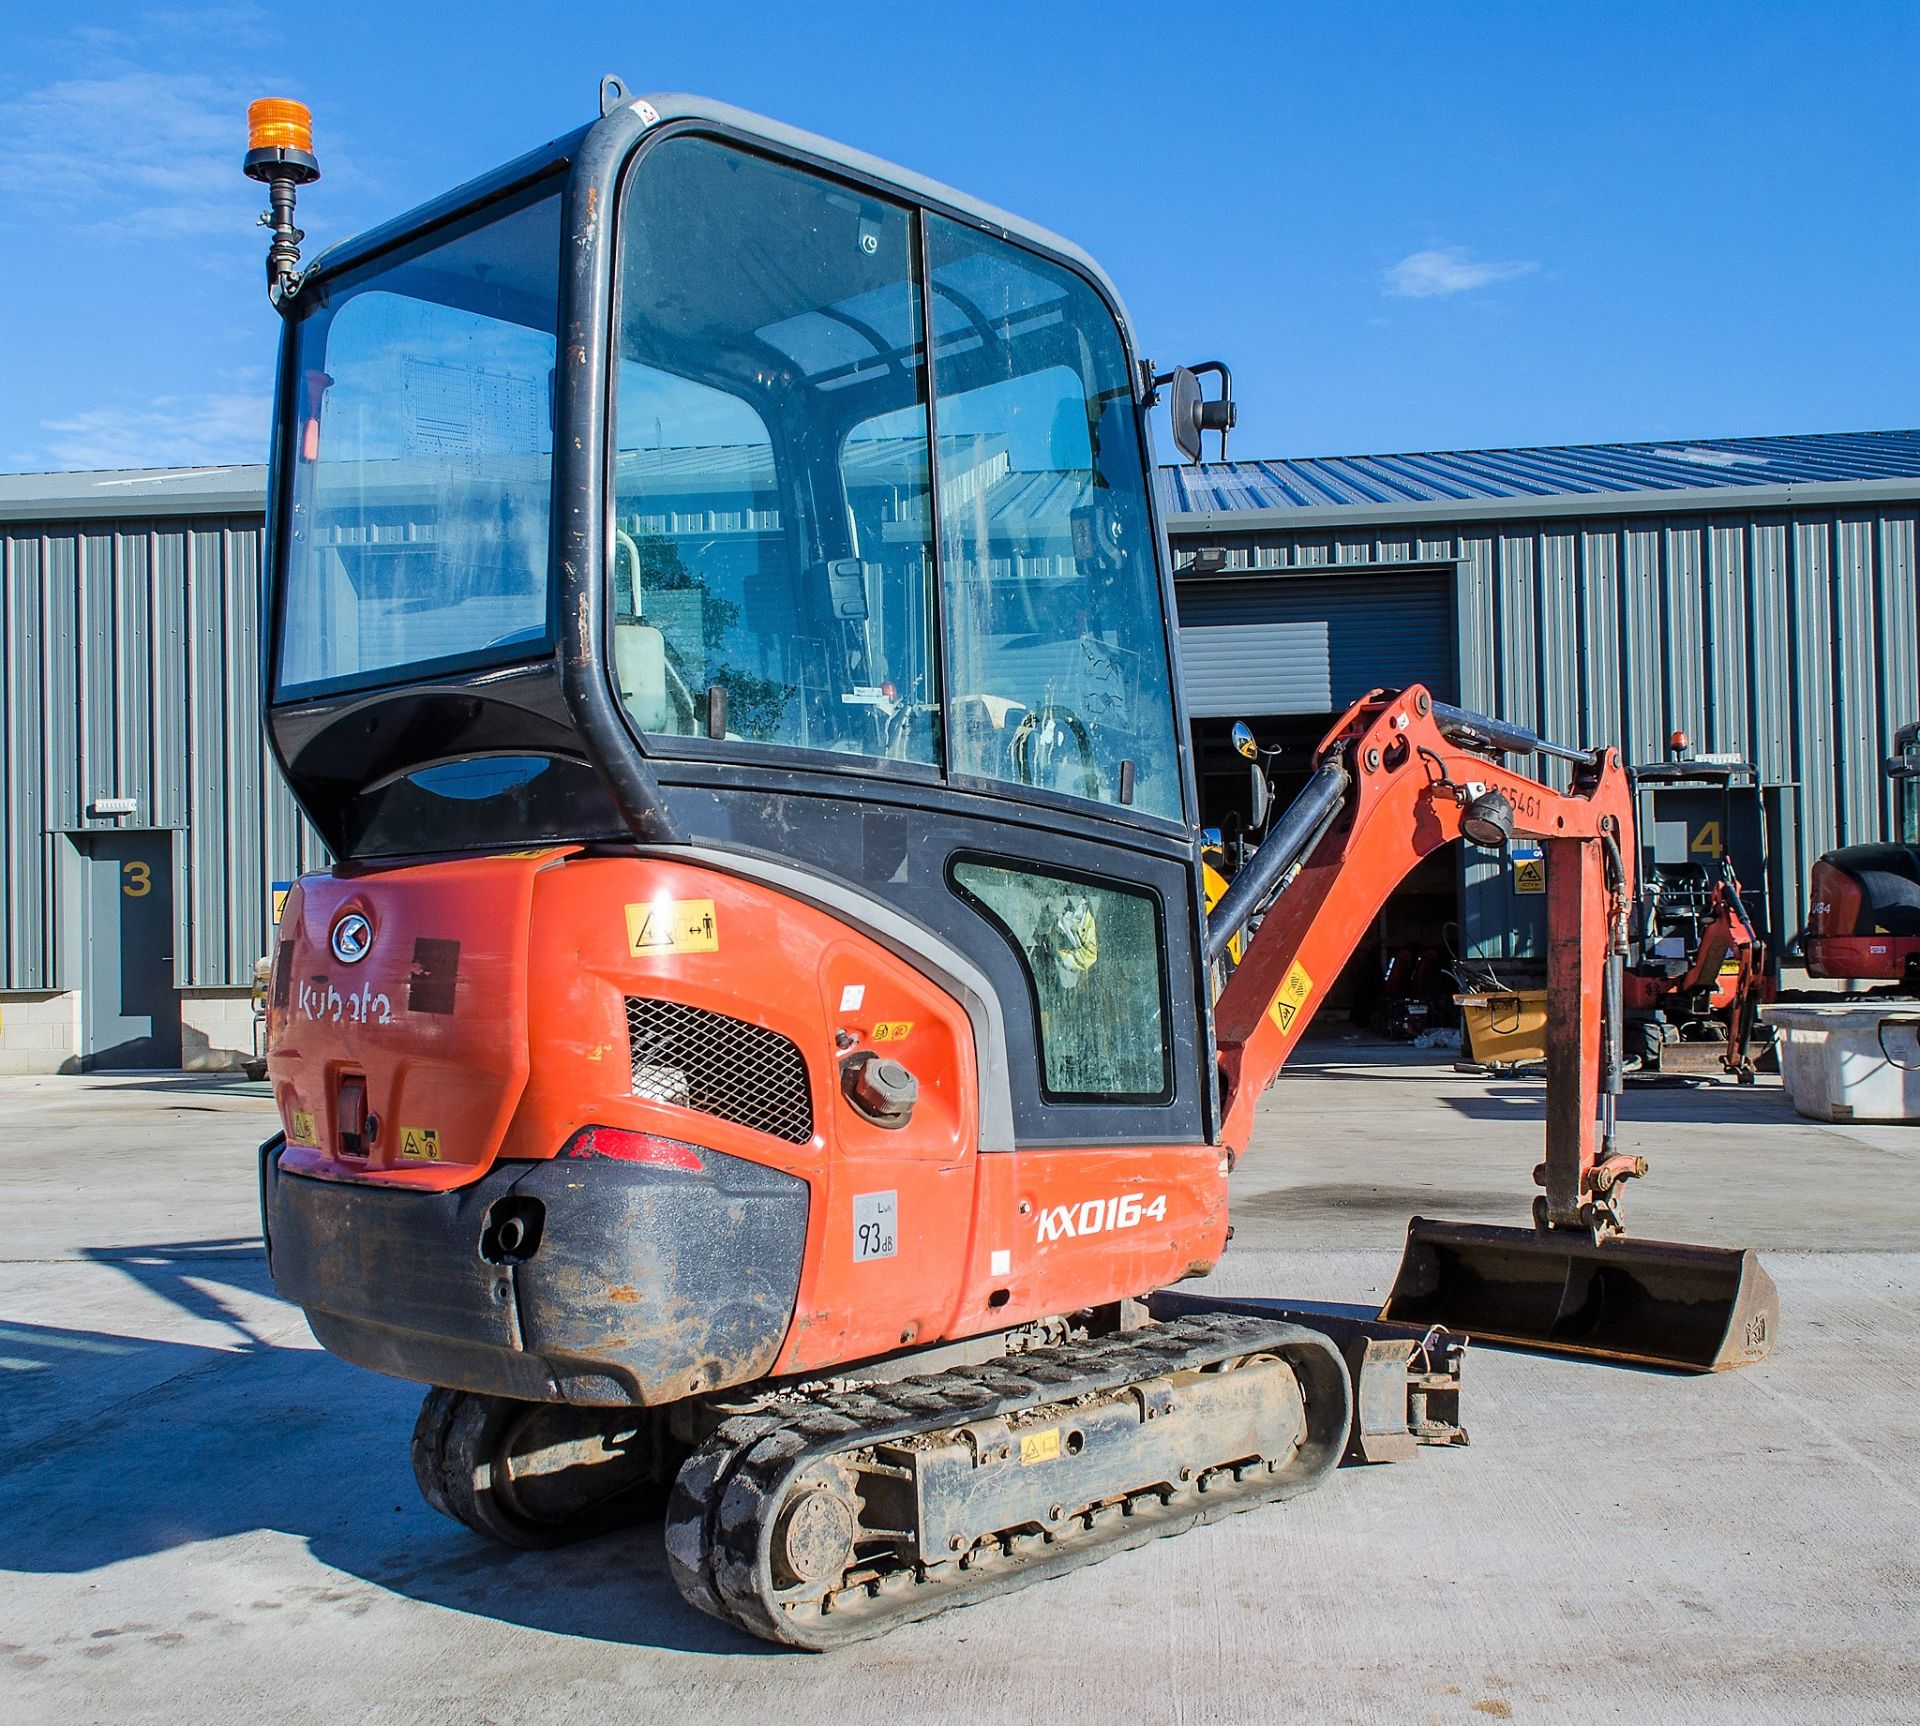 Kubota KX016-4 1.5 tonne rubber tracked mini excavator Year: 2015 S/N: 58688 Recorded Hours: 1736 - Image 4 of 19